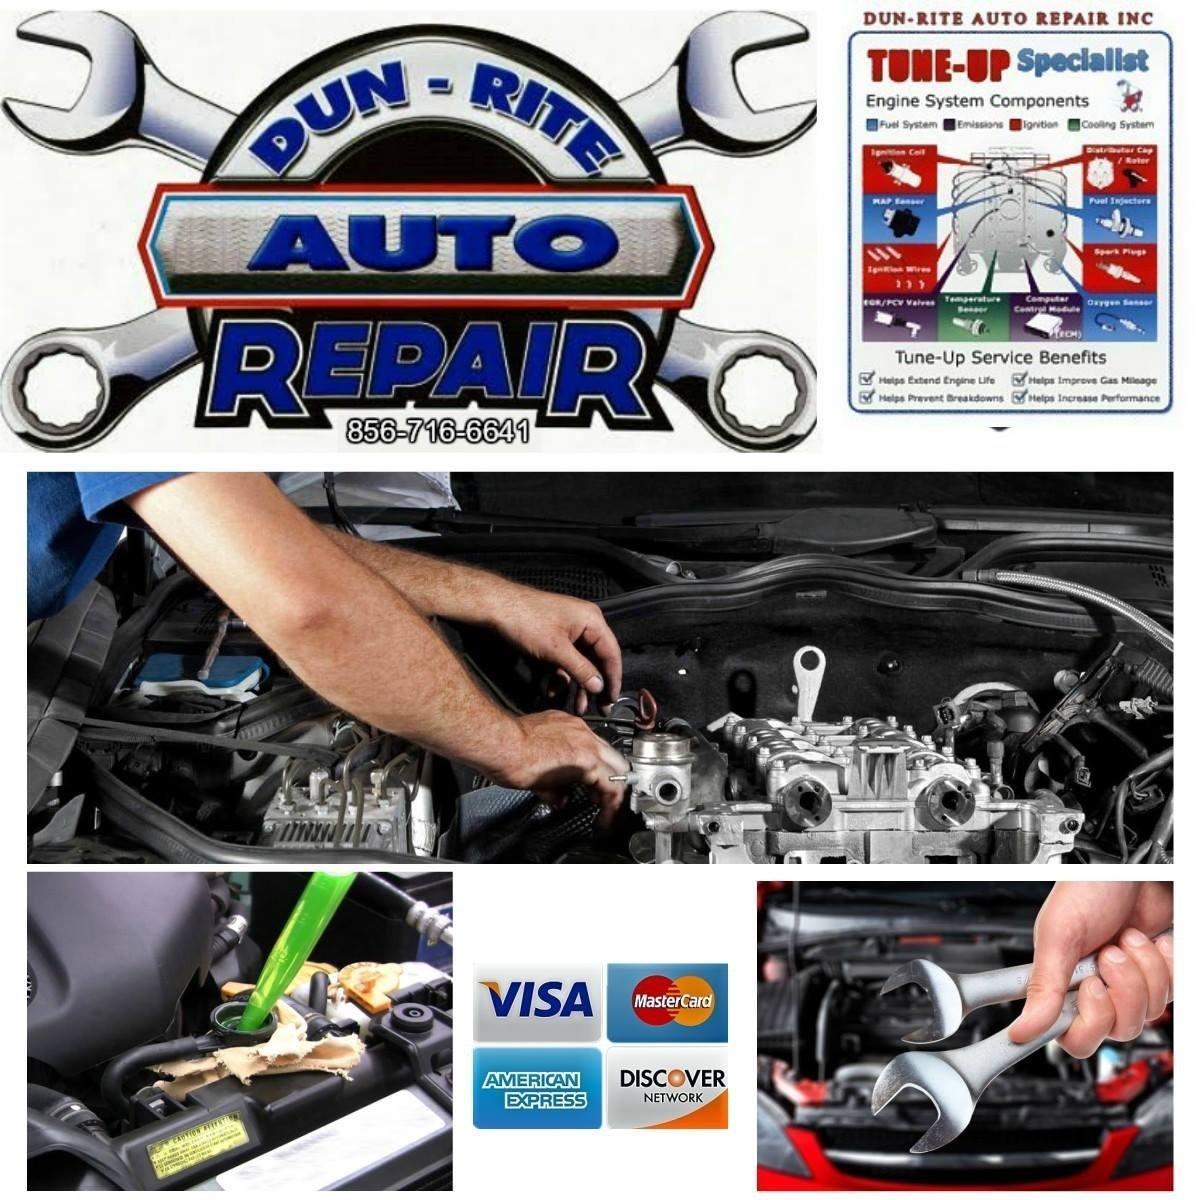 Dun Rite Auto repair llc - sewell, NJ - General Auto Repair & Service